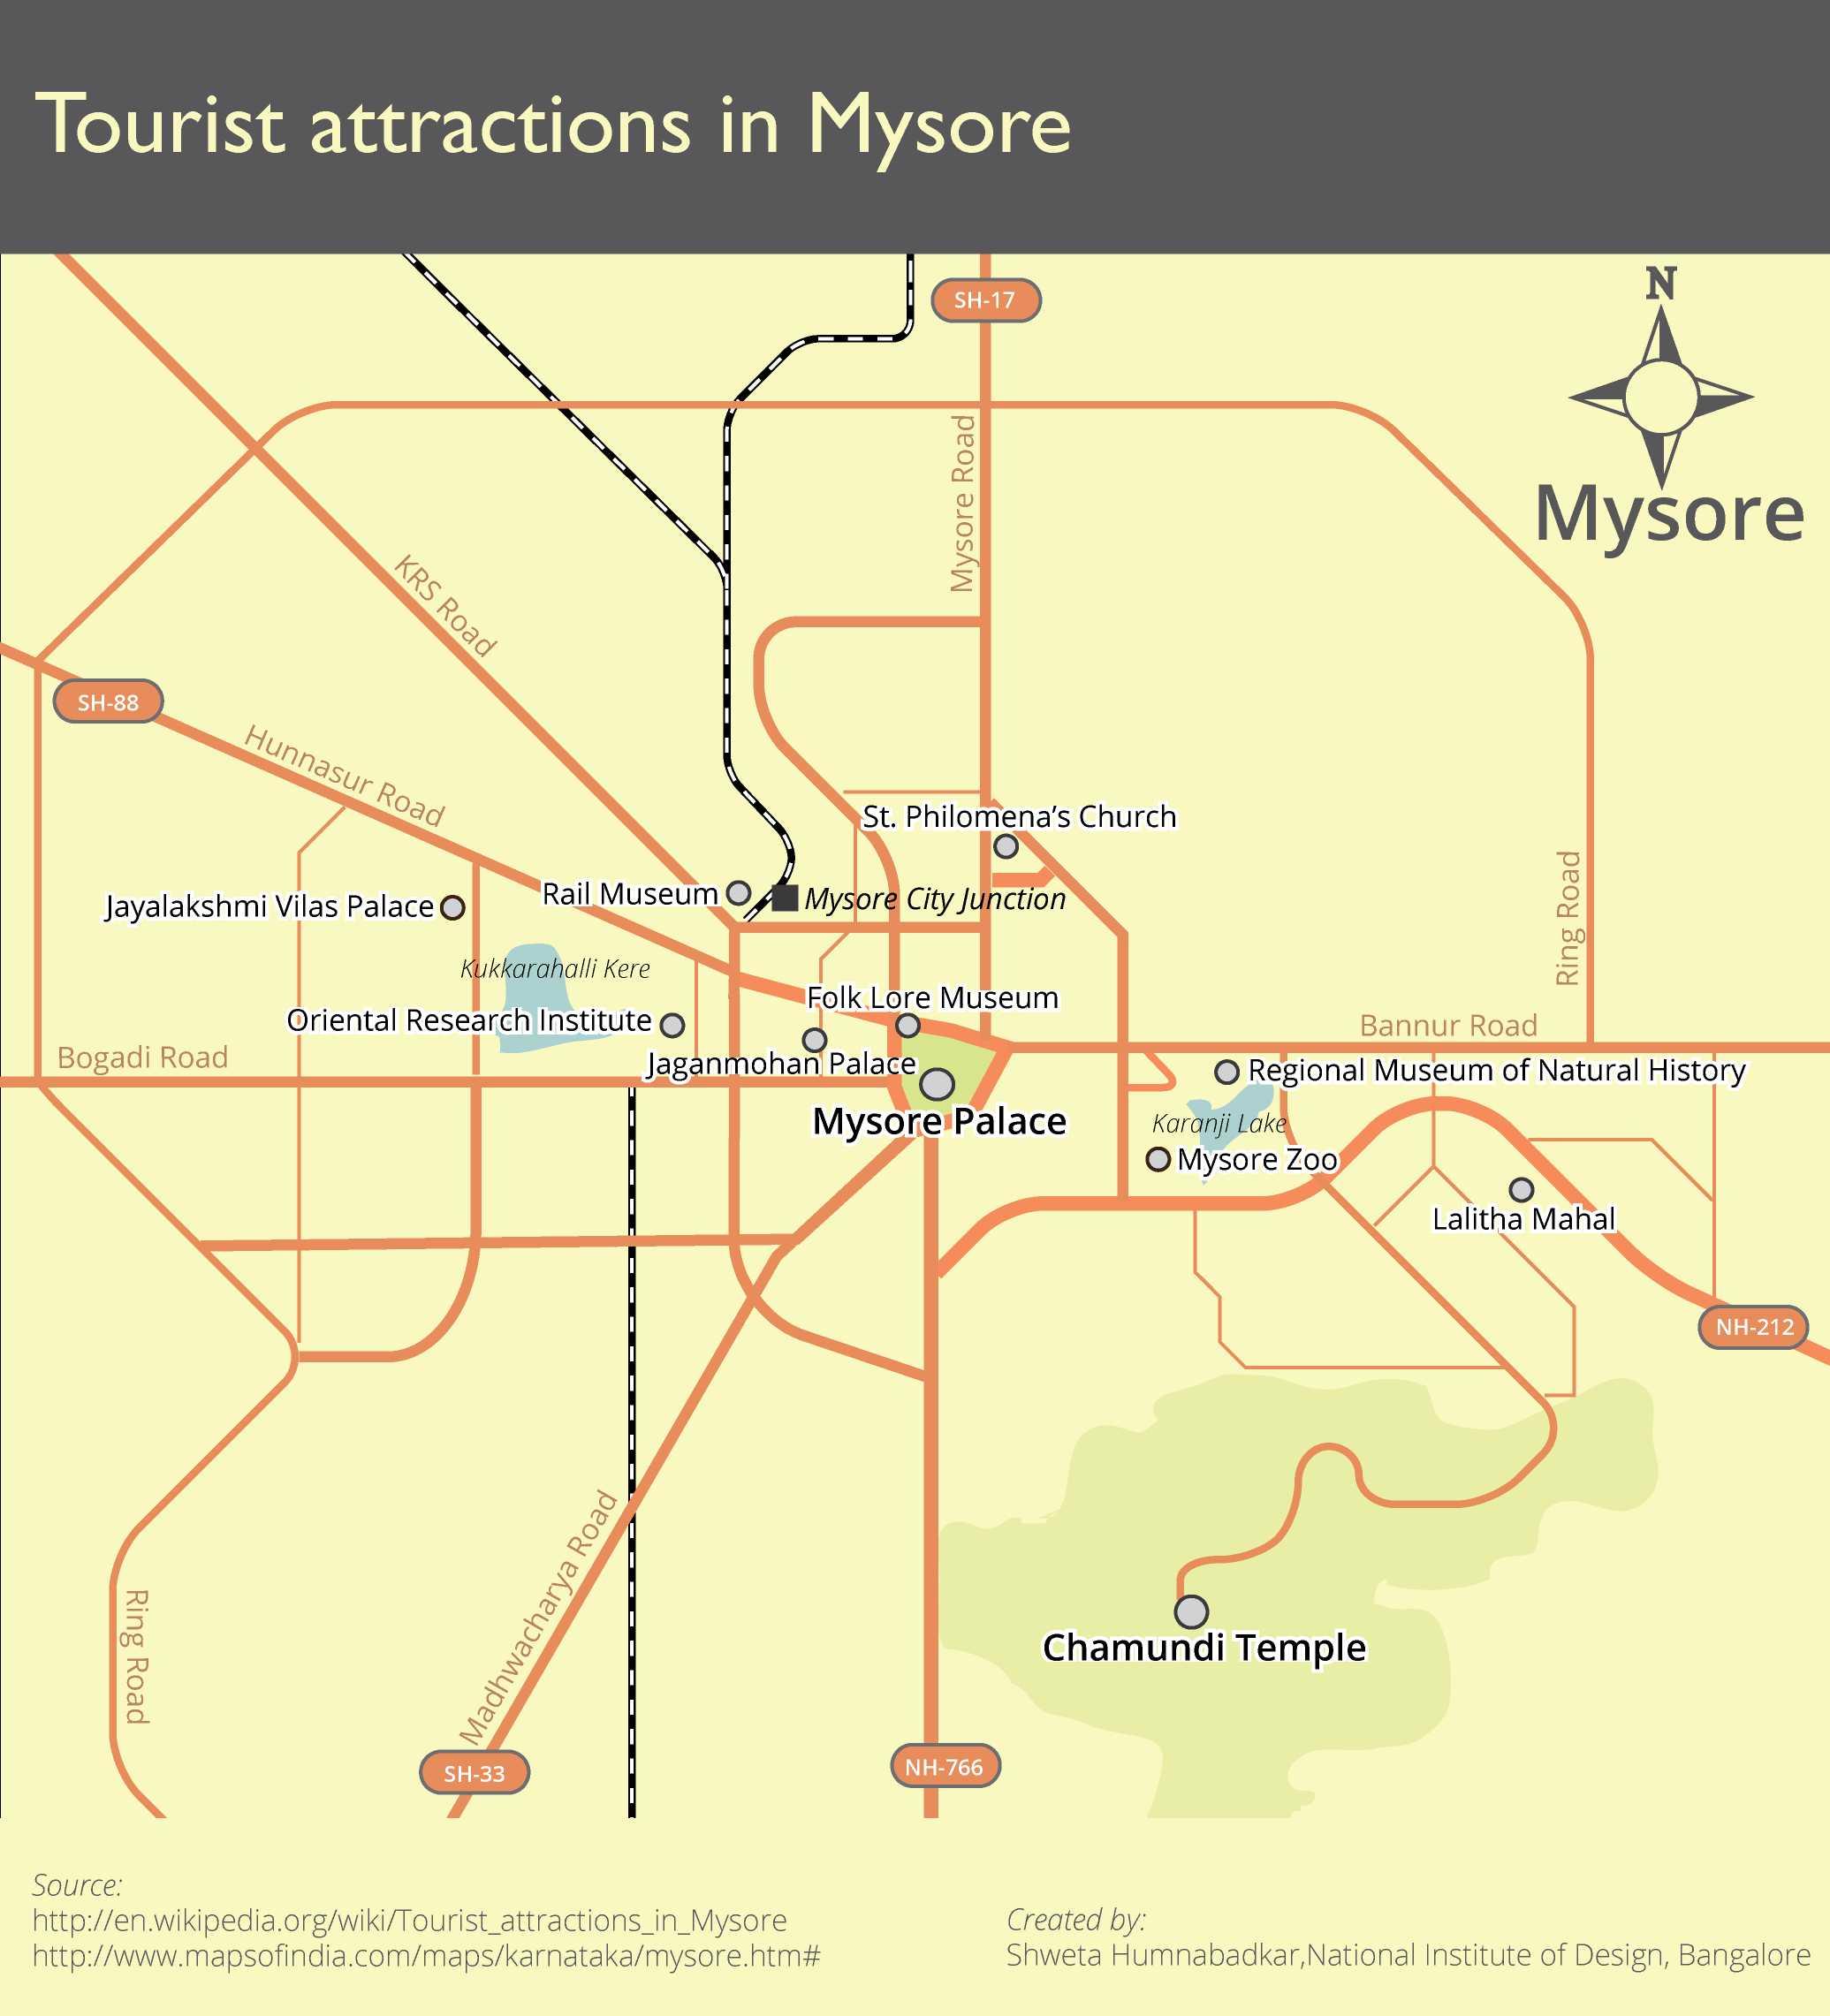 File:Schematic tourist map of Mysore.jpg - Wikimedia Commons